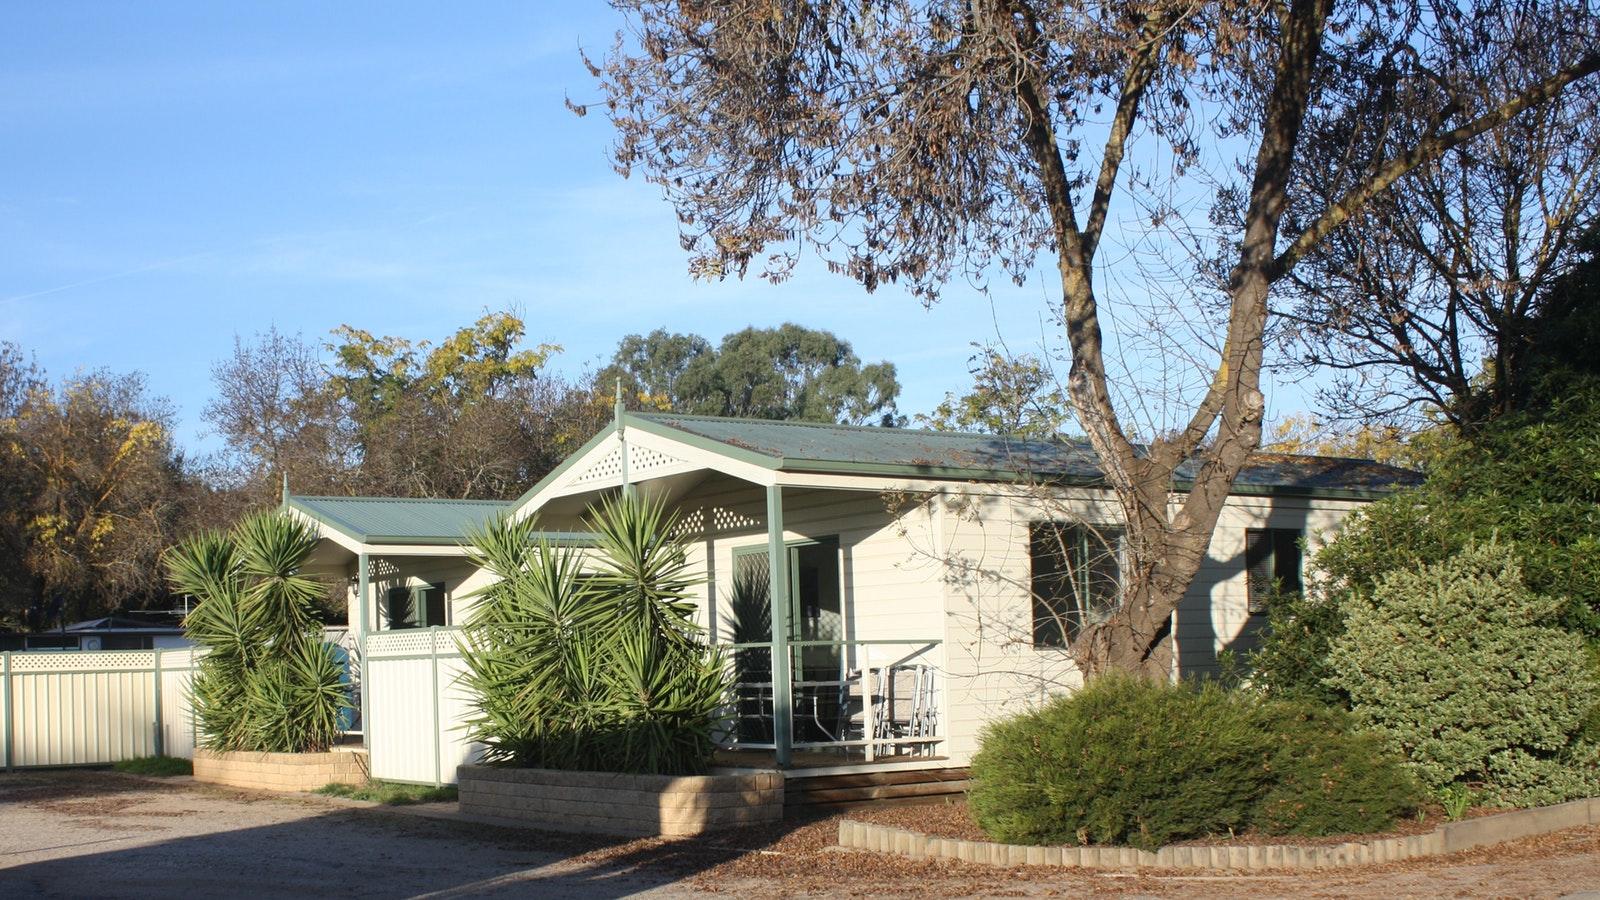 2 Bedroom Deluxe cabins, well shaded front verandah,